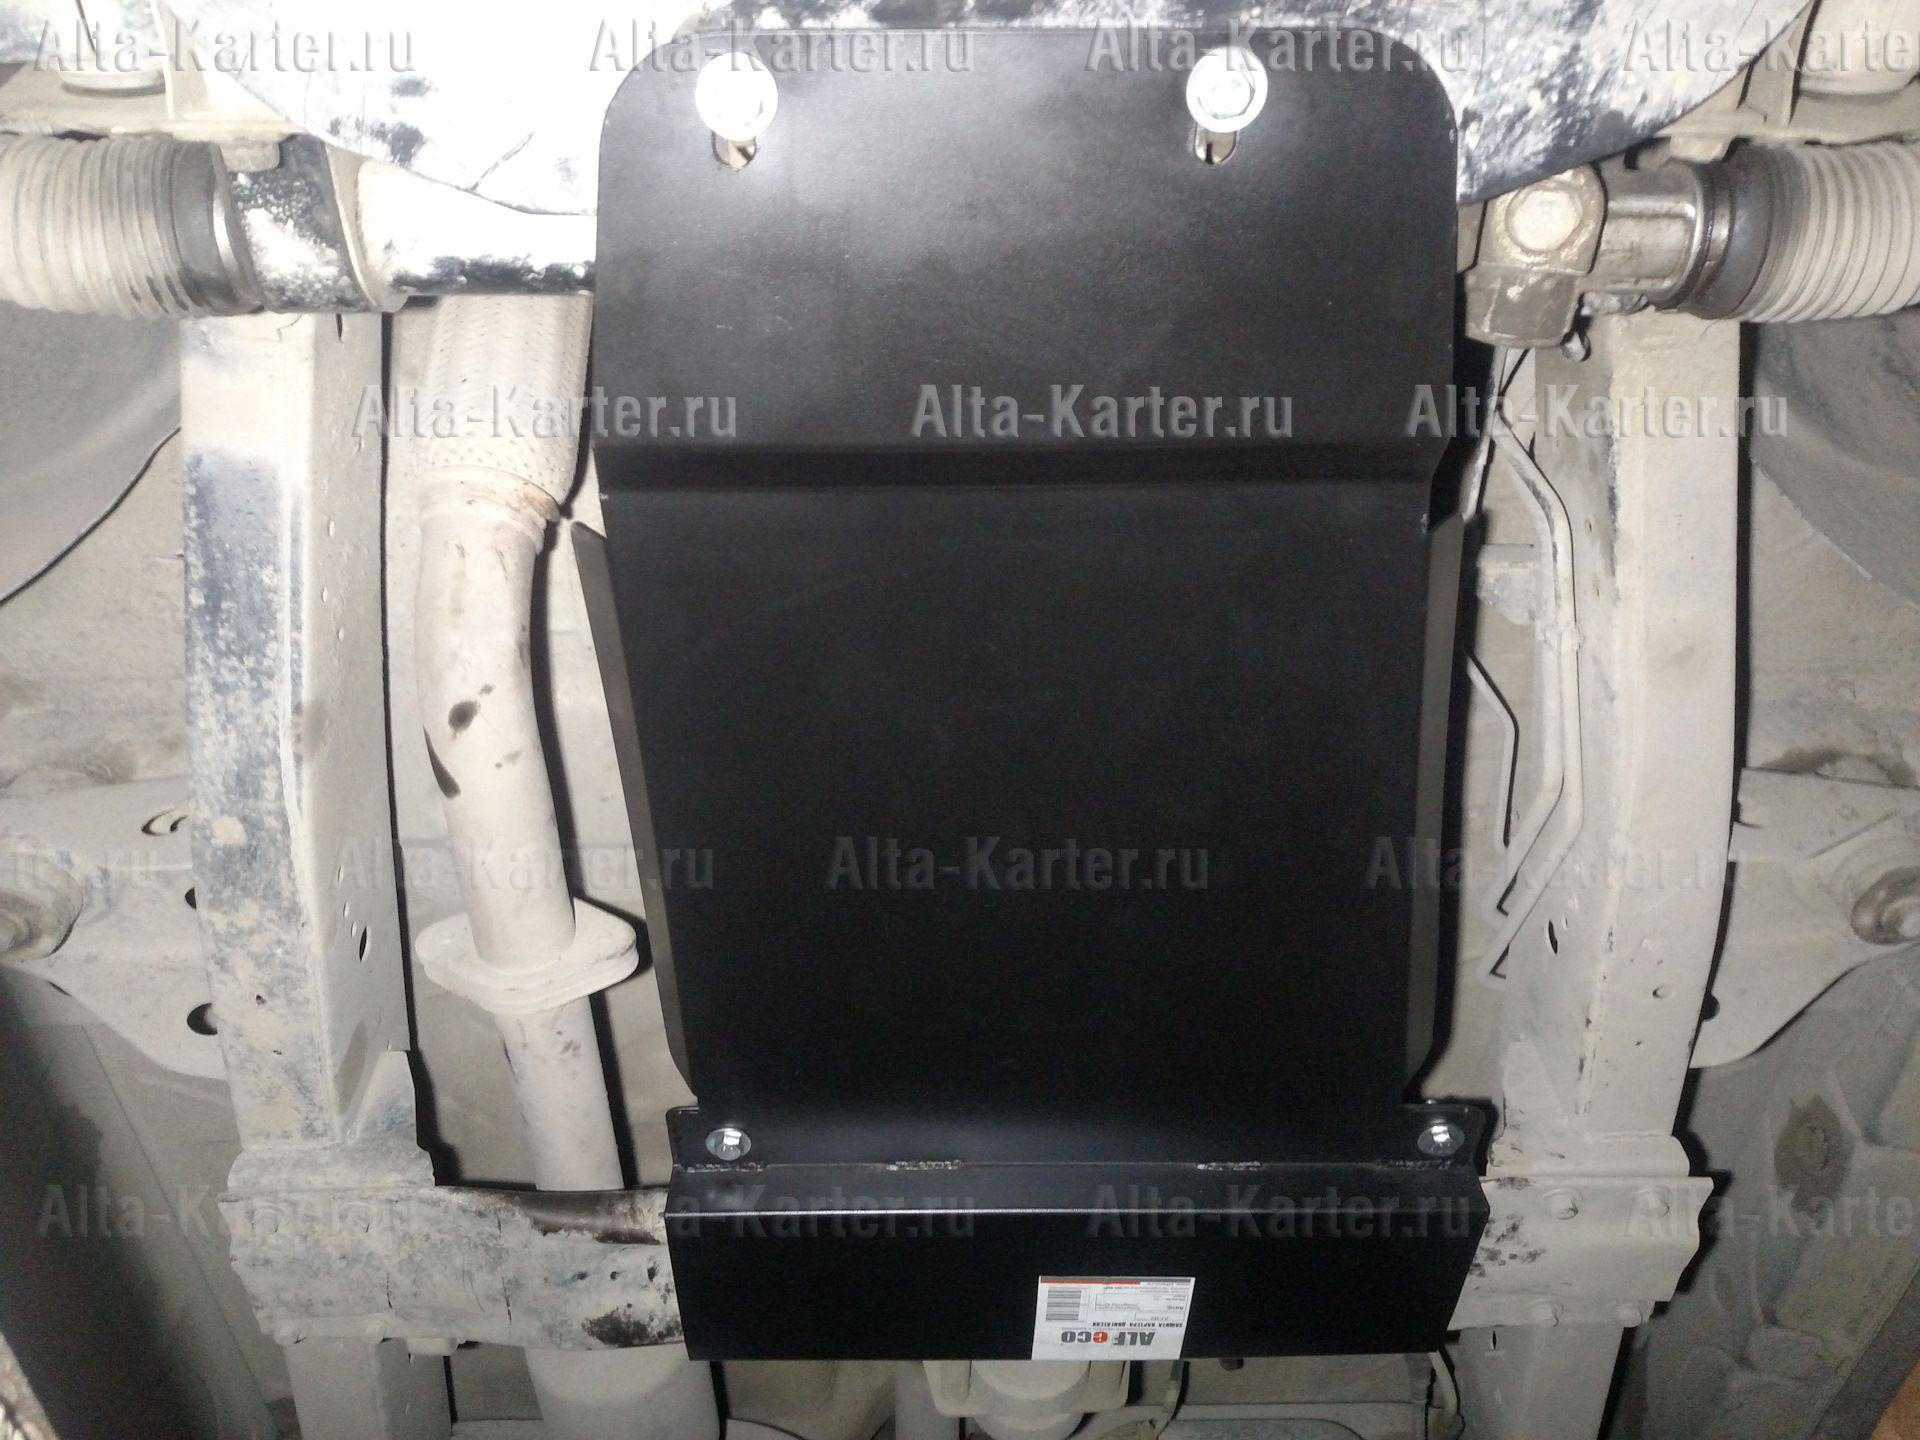 Защита Alfeco для КПП SsangYong Actyon I 2005-2011. Артикул ALF.21.02